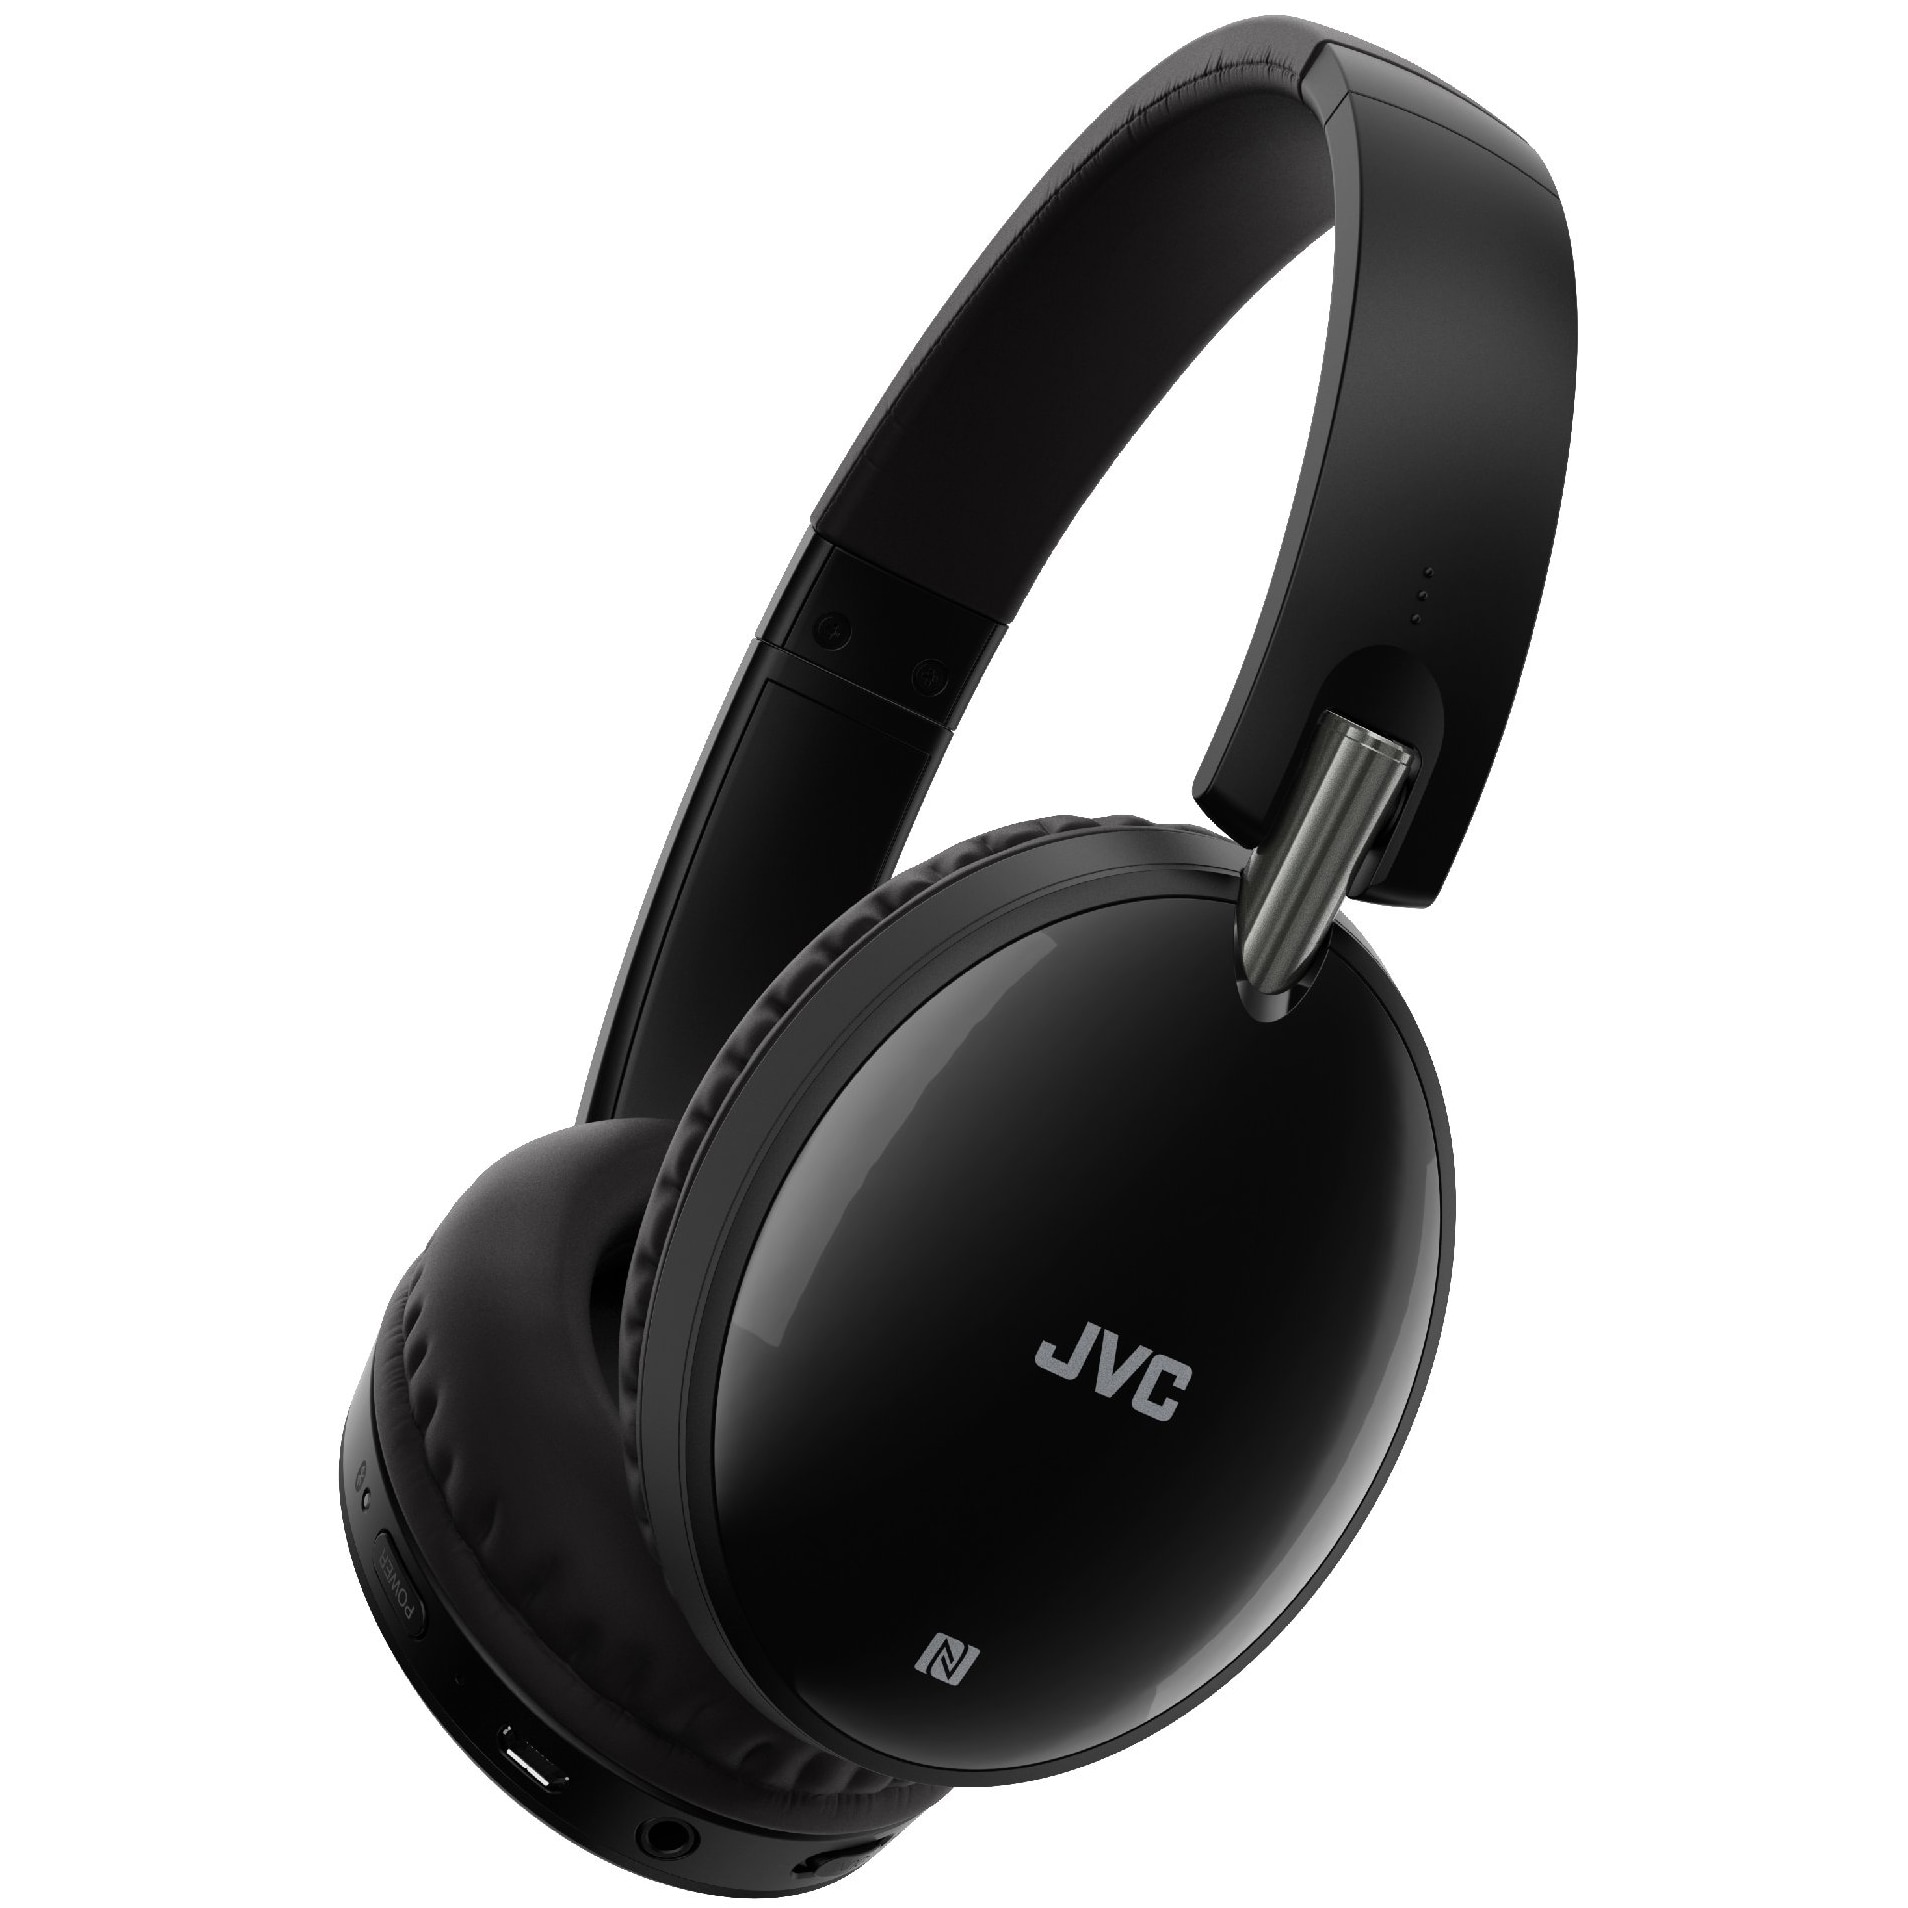 Fotografie Casti Audio Over the Ear JVC HA-S90BN-B-E, Wireless, Bluetooth, Noise cancelling, Microfon, Autonomie 27 ore, Negru